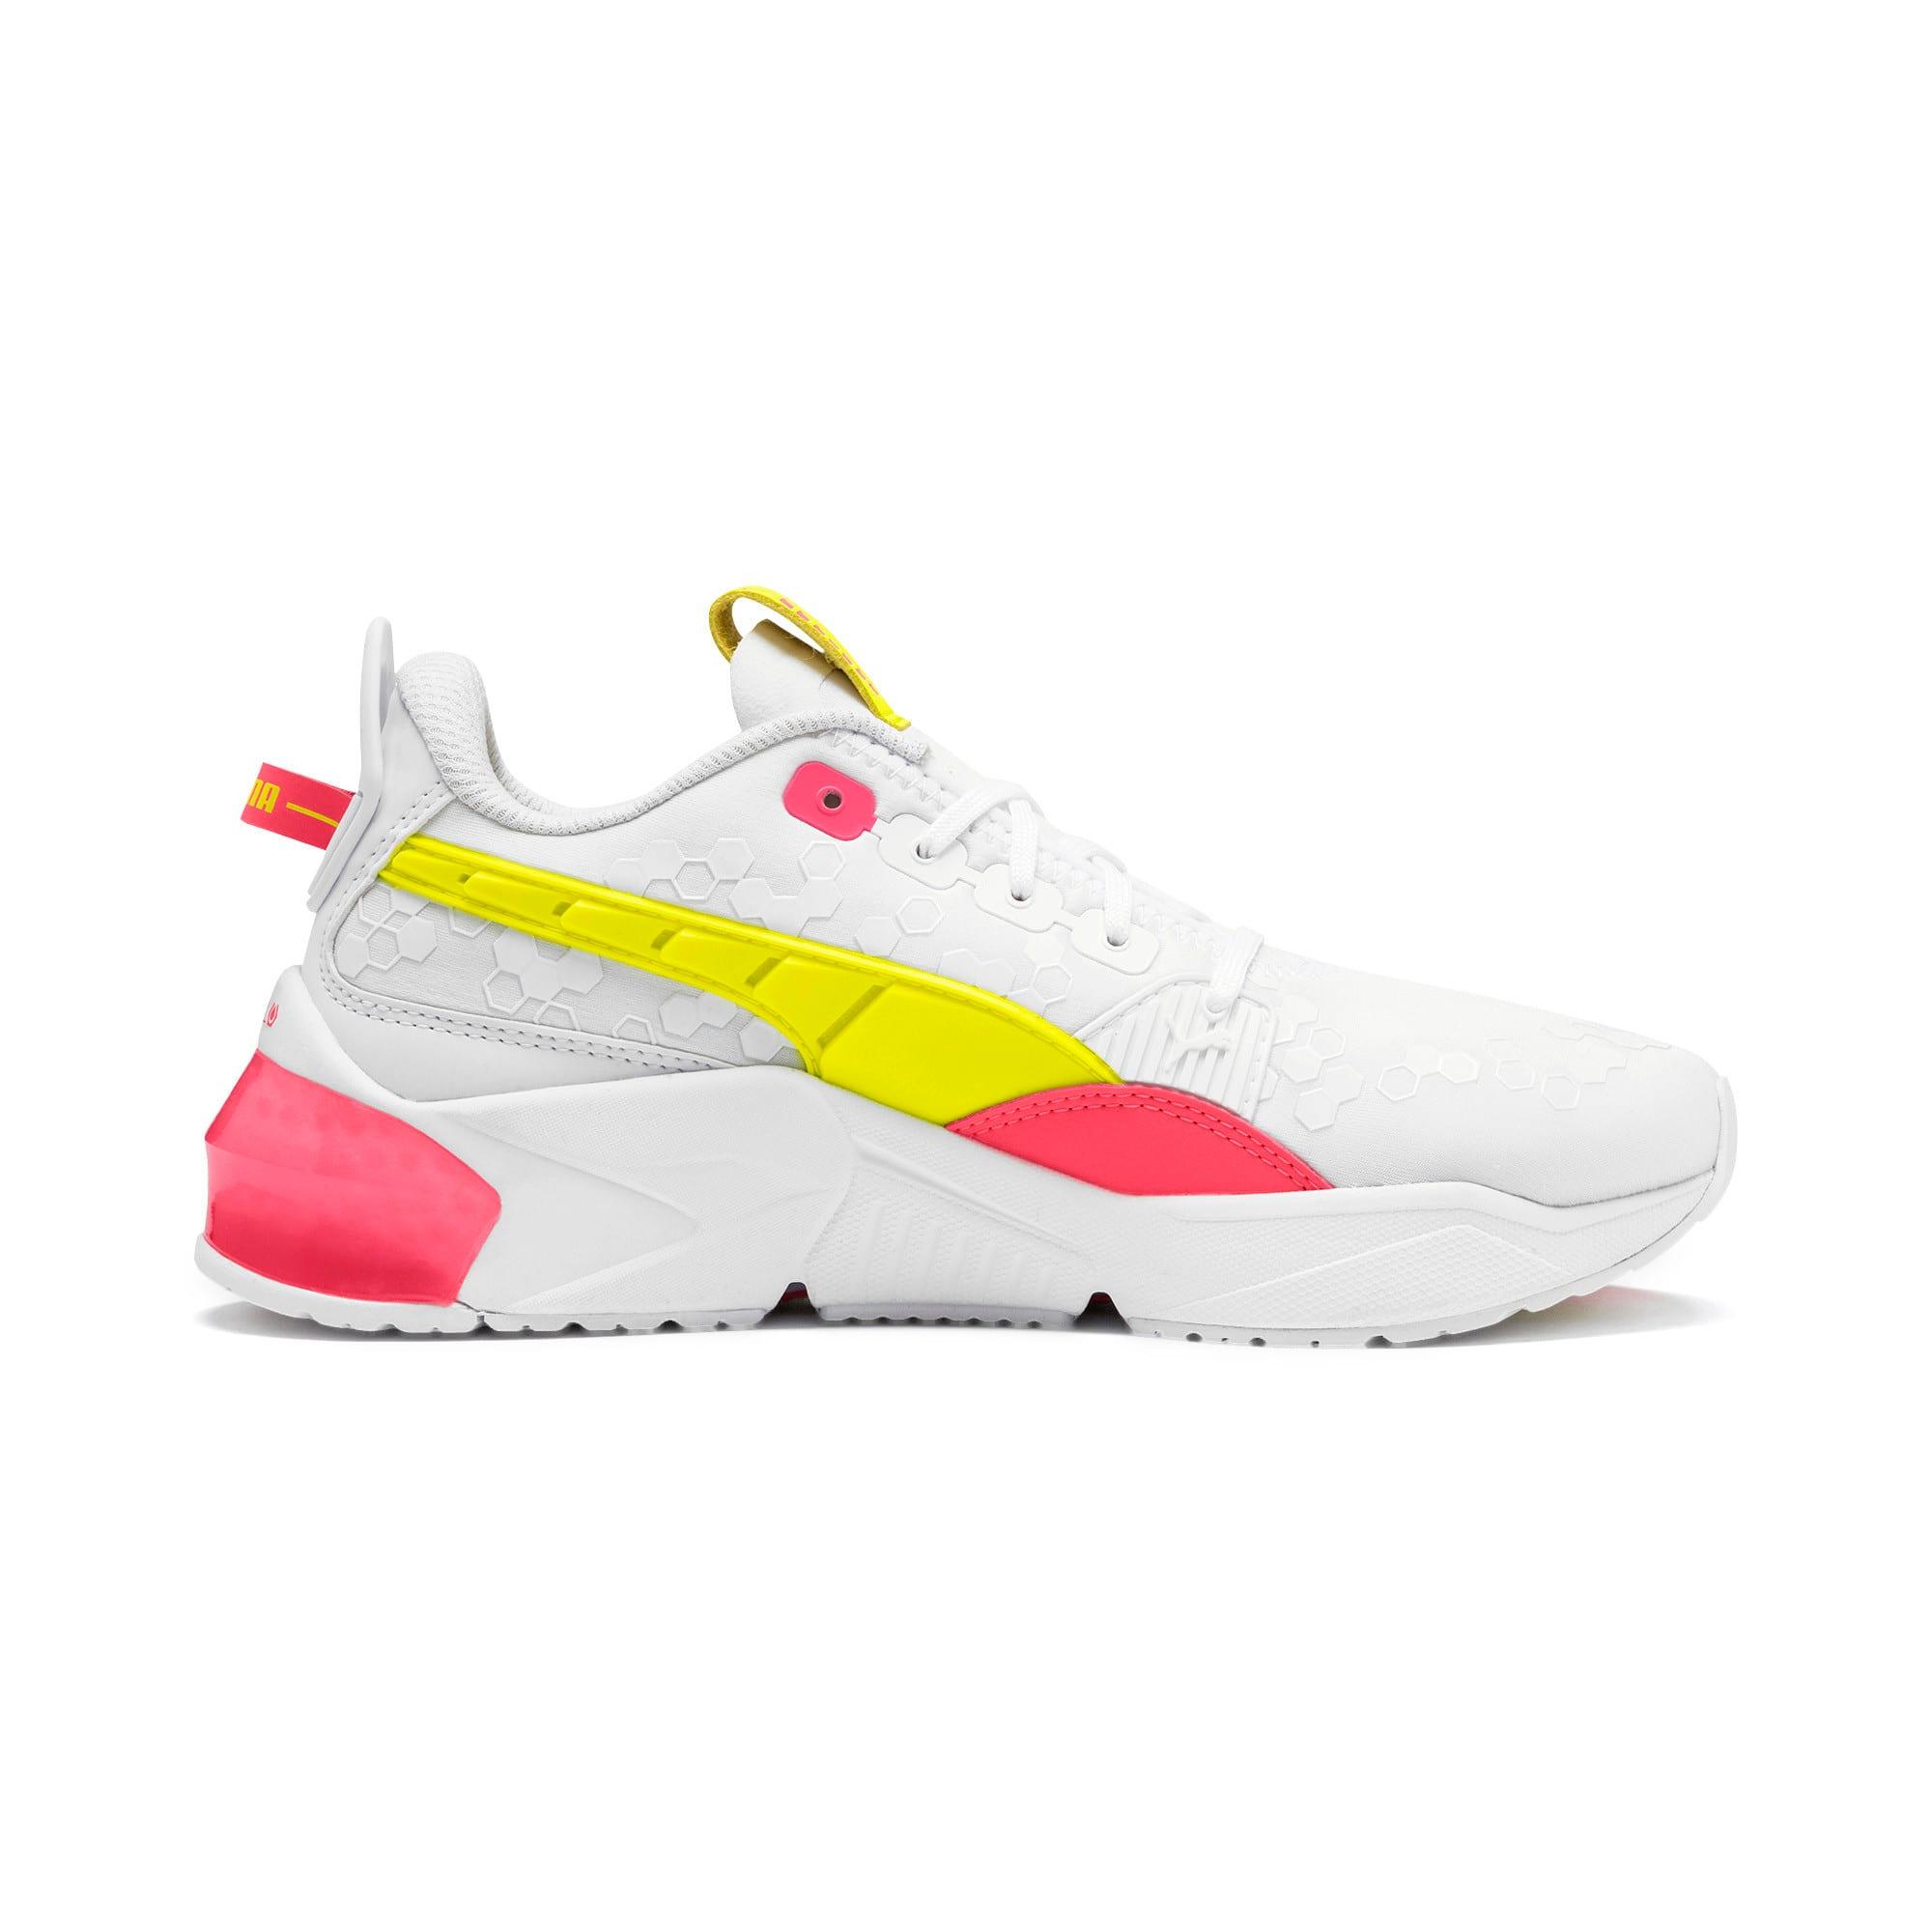 Thumbnail 6 of LQDCELL Optic Training Shoes, Puma White-Y Alert-Pin Alert, medium